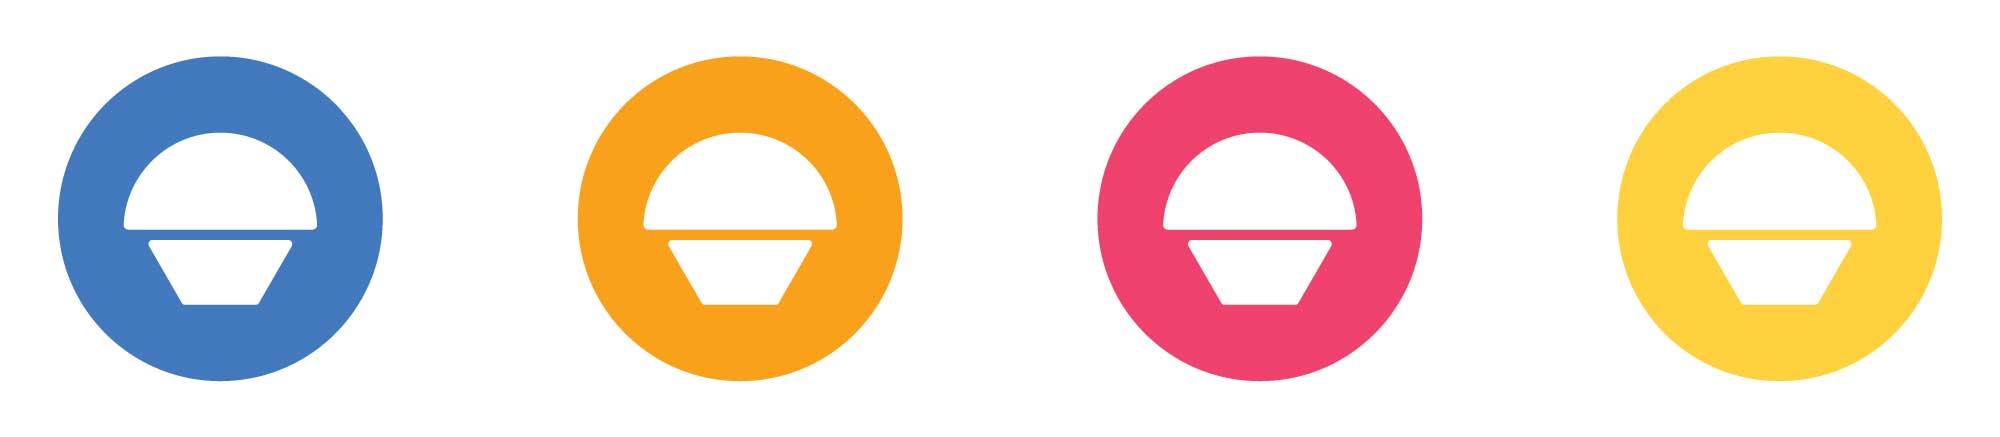 icon-lineup.jpg